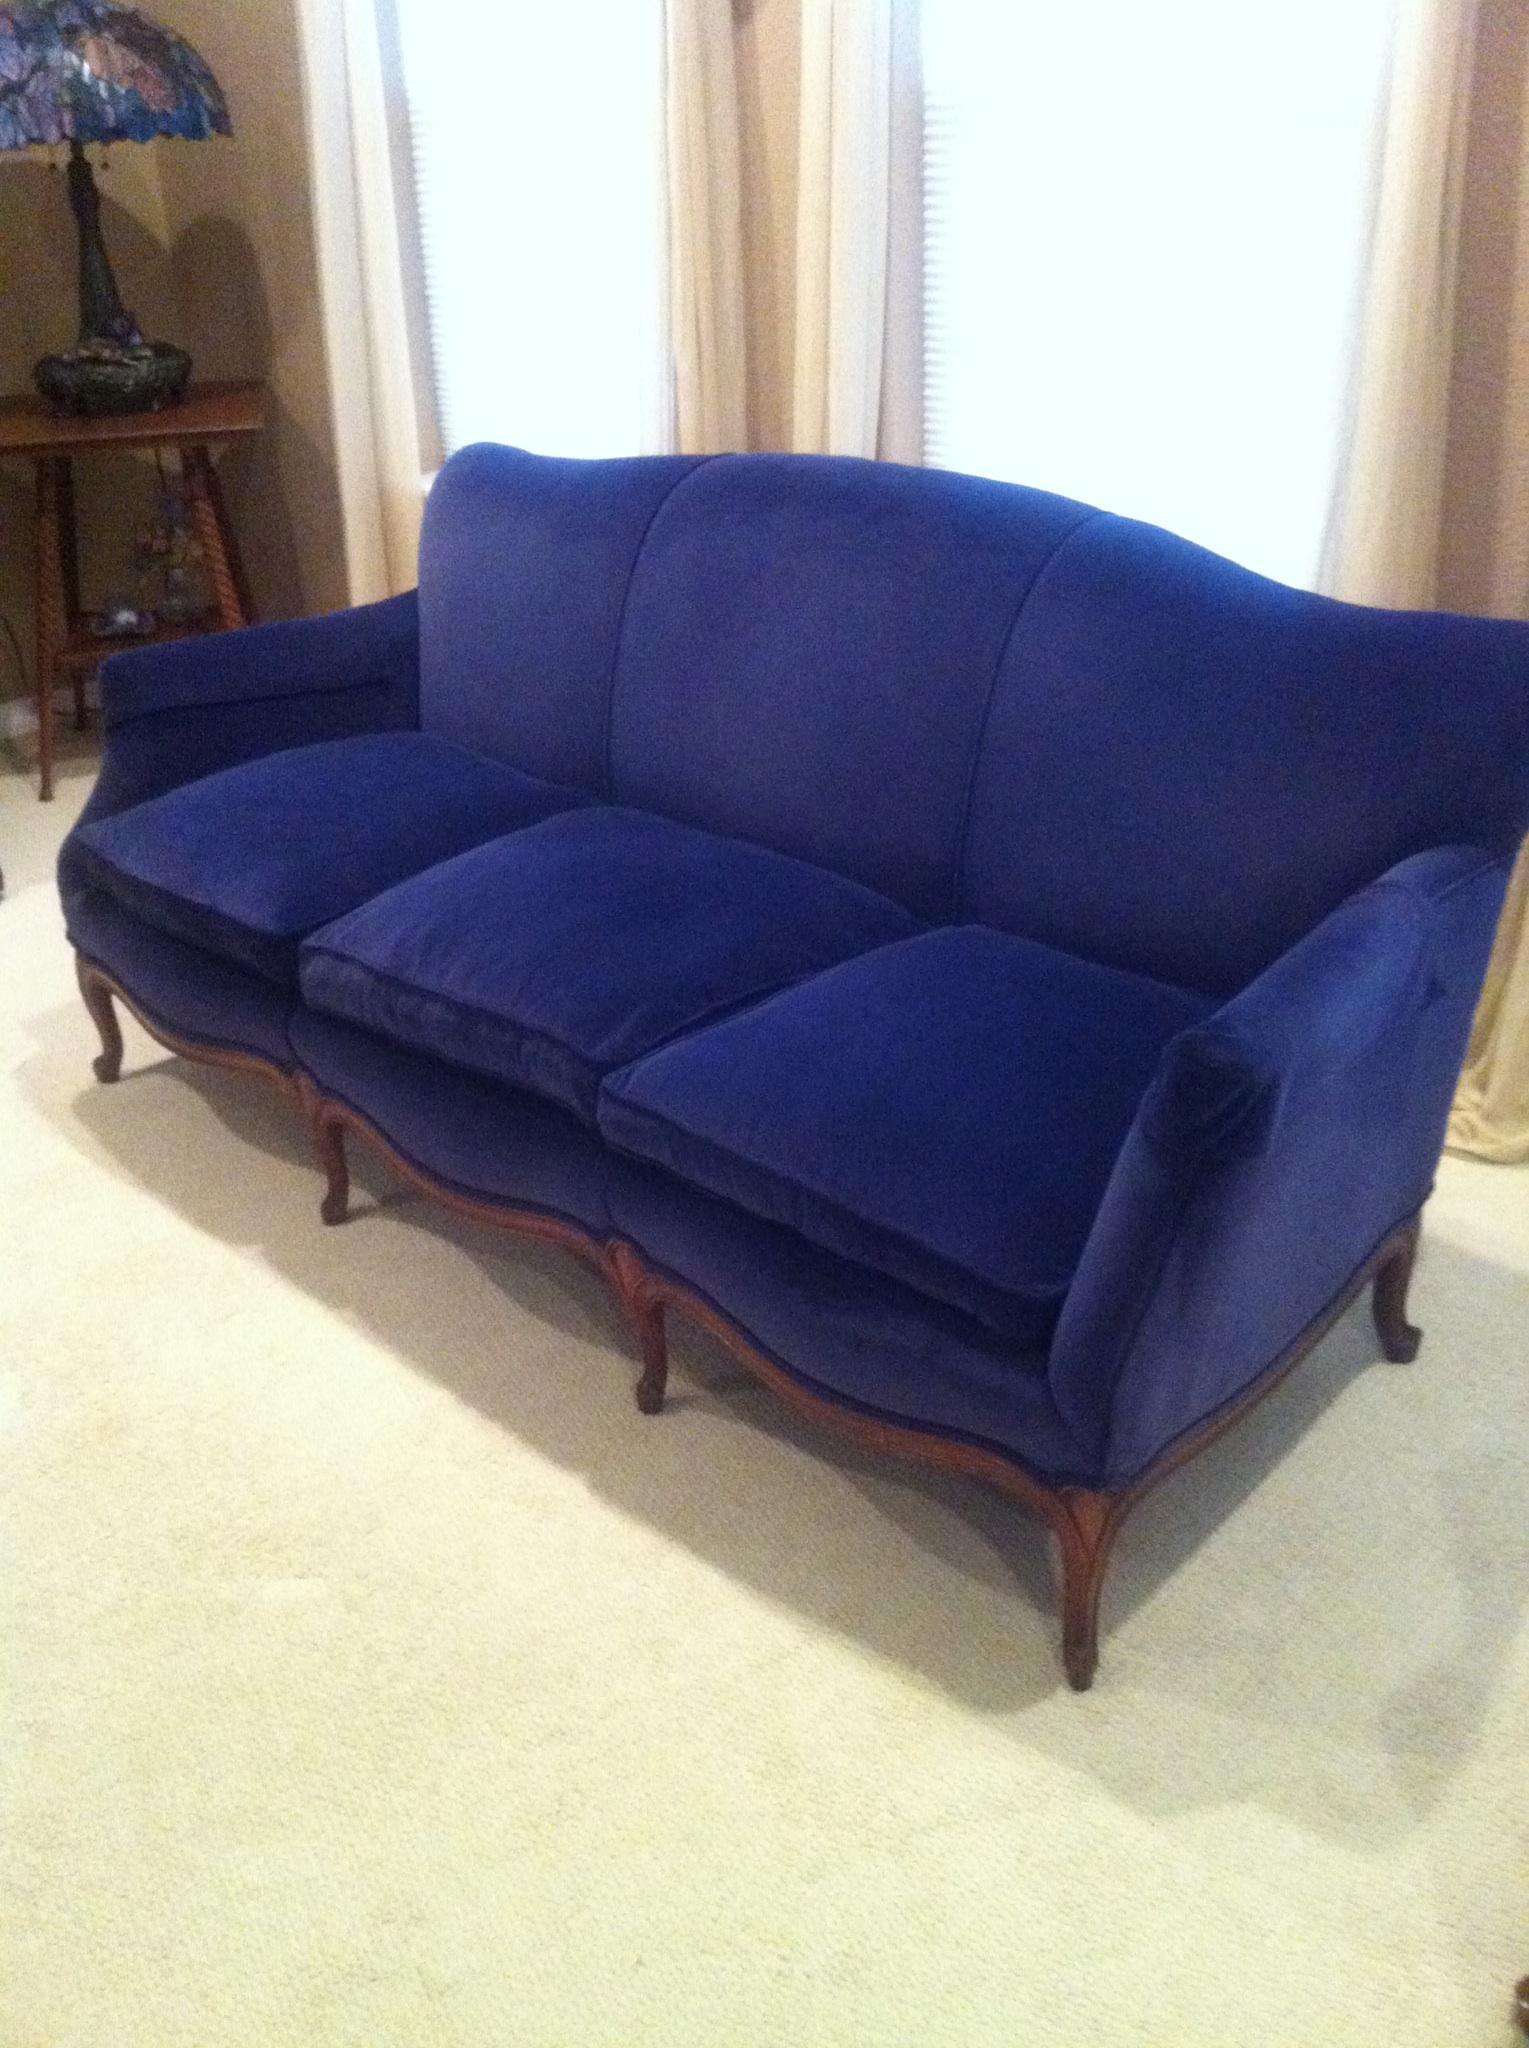 Vintage Sofa For Sale Fainting Antique Fainting For Sale